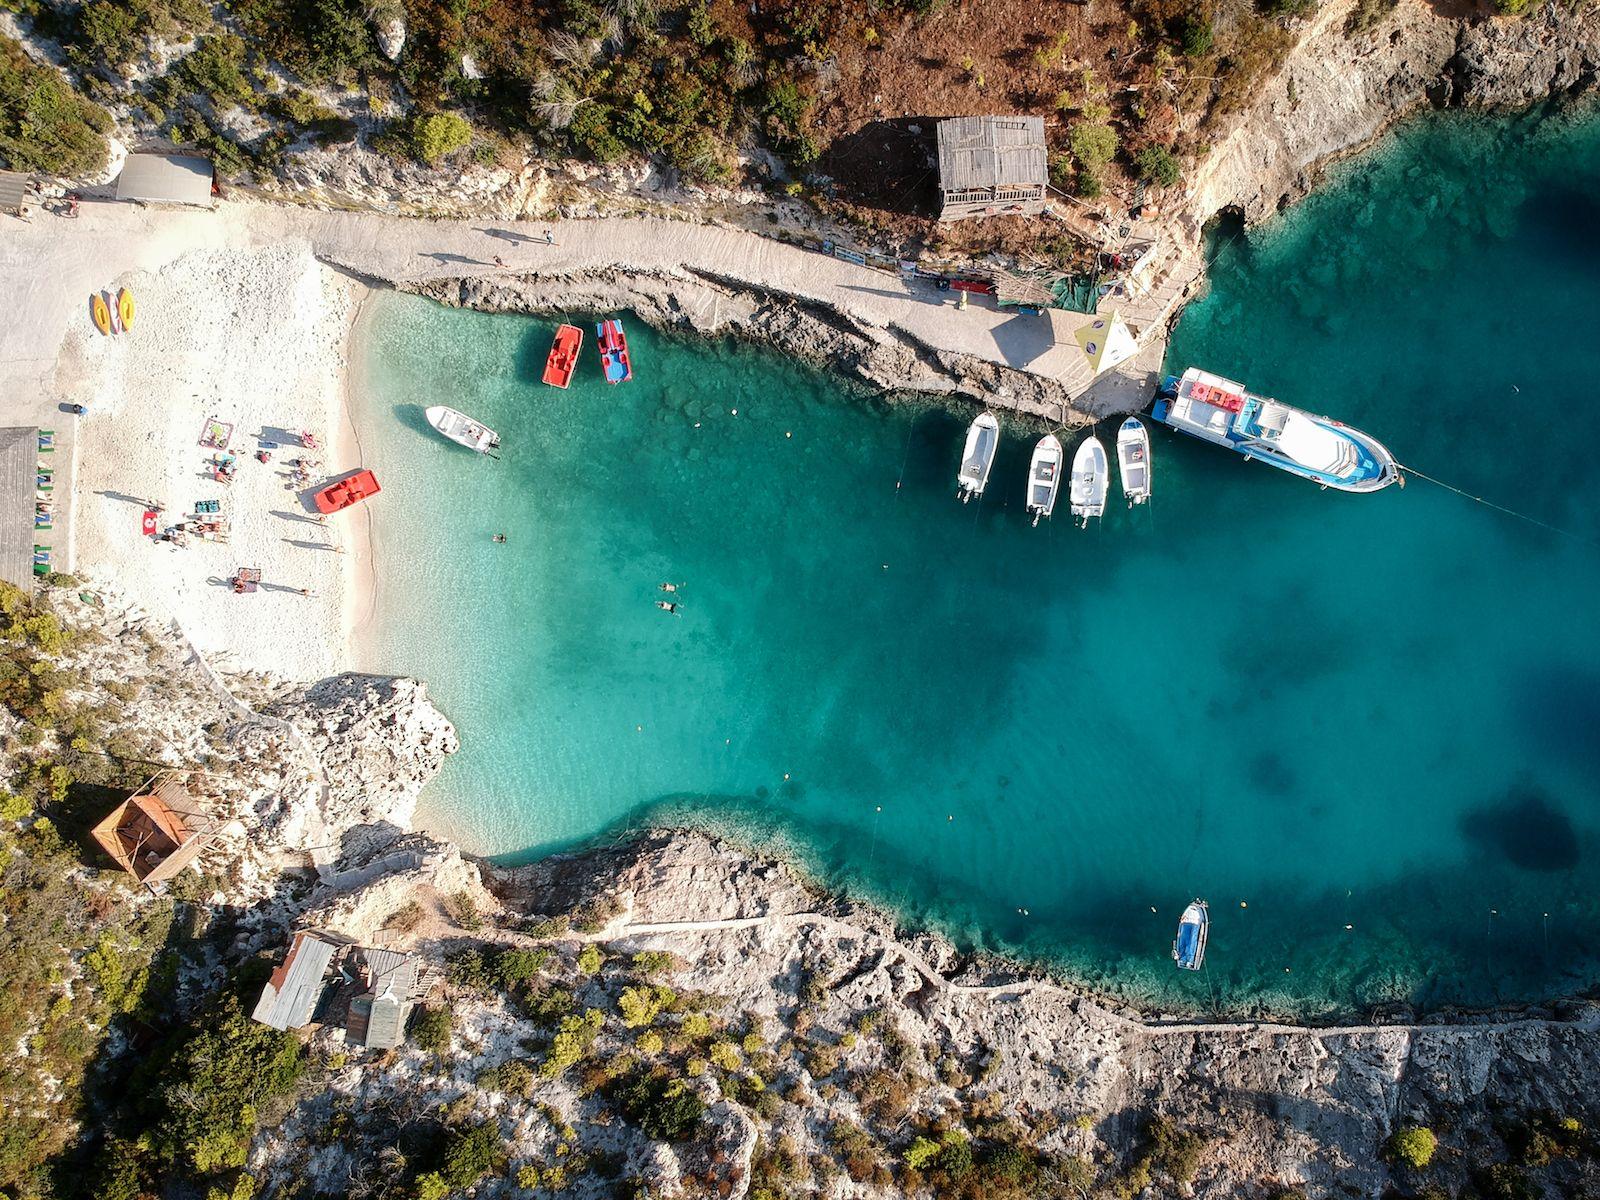 Wes & Gareth paddling back to shore at Porto Vromi